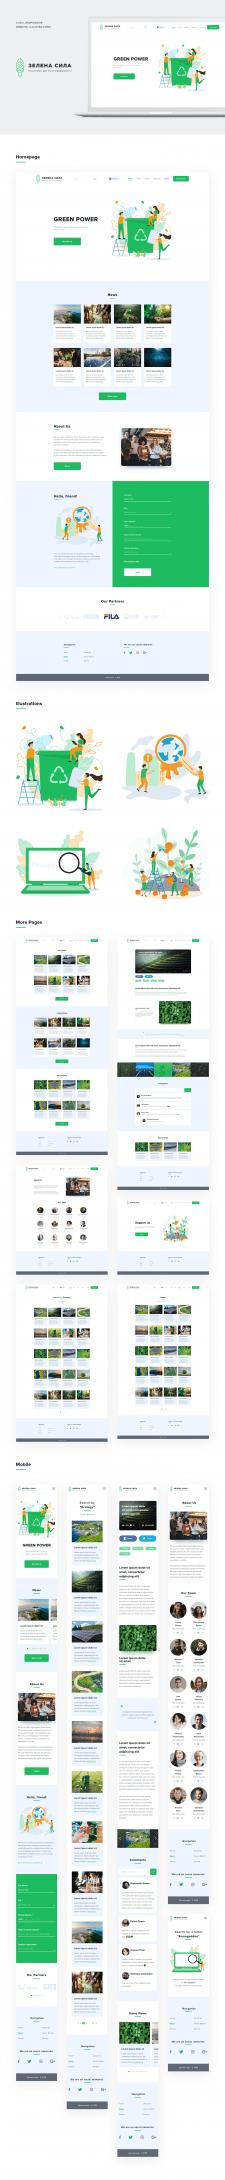 Green Power eco organization website